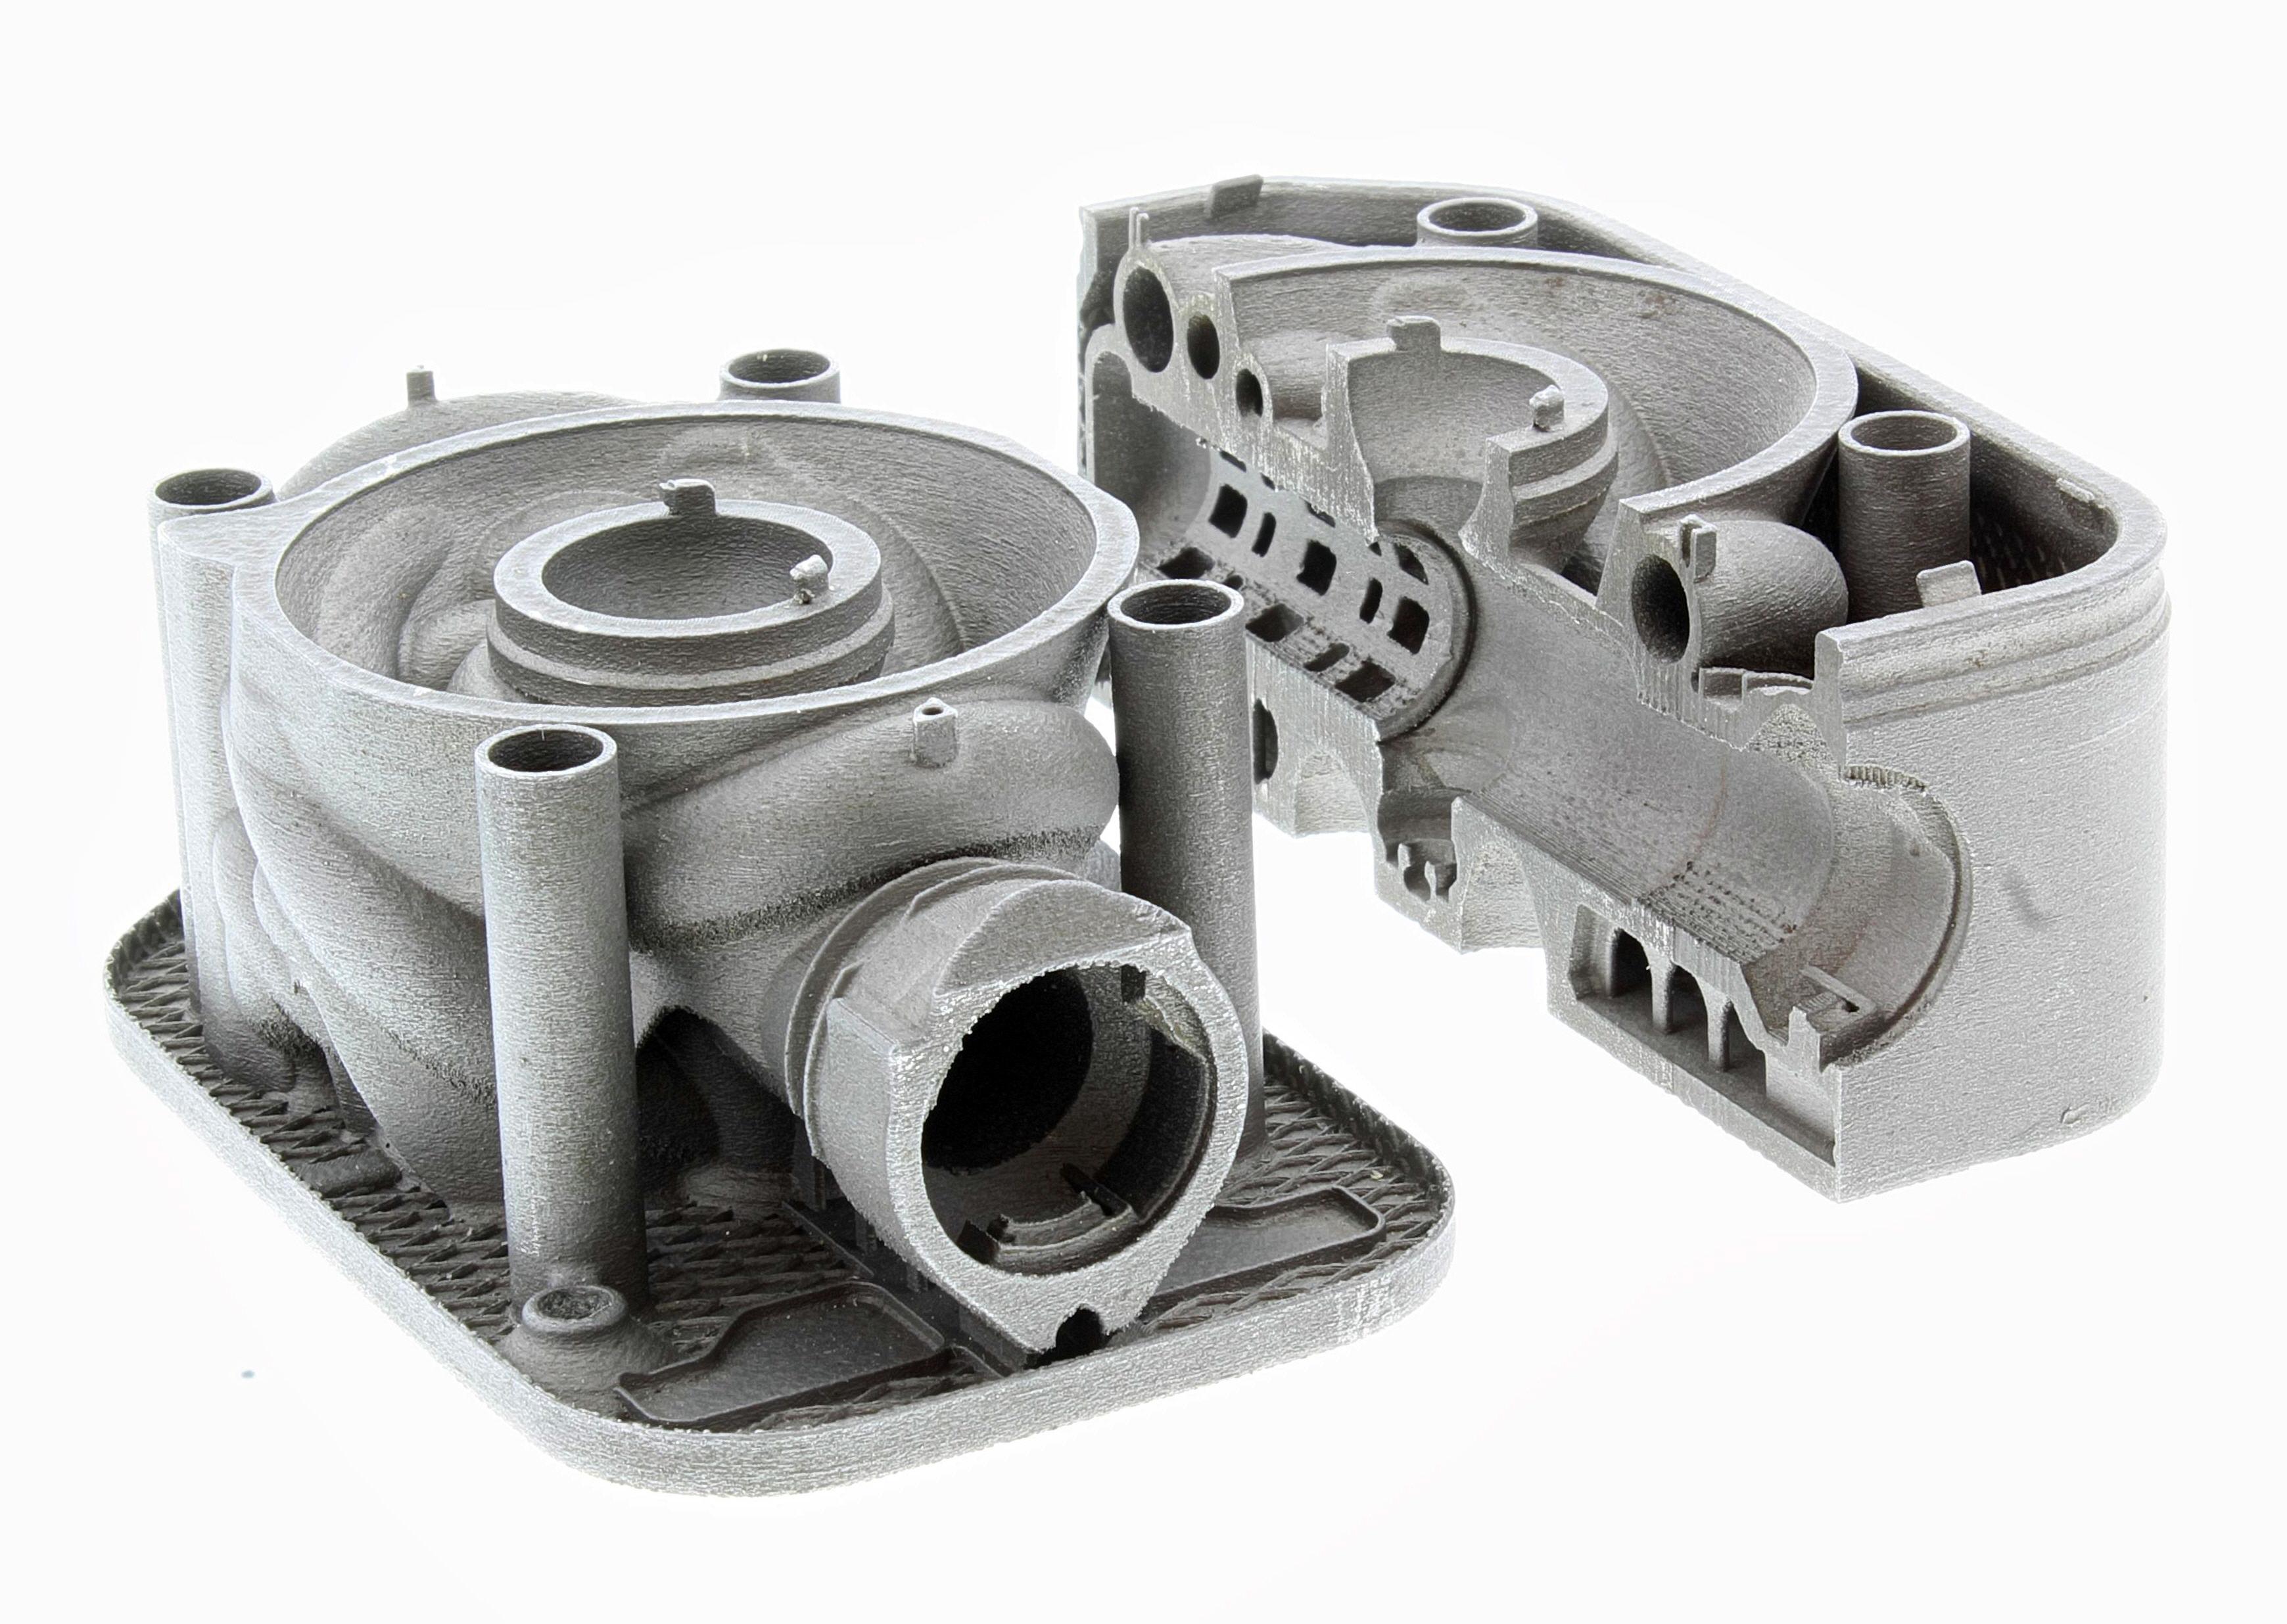 Domin's Fluid direct drive servo valve manufactured using AM